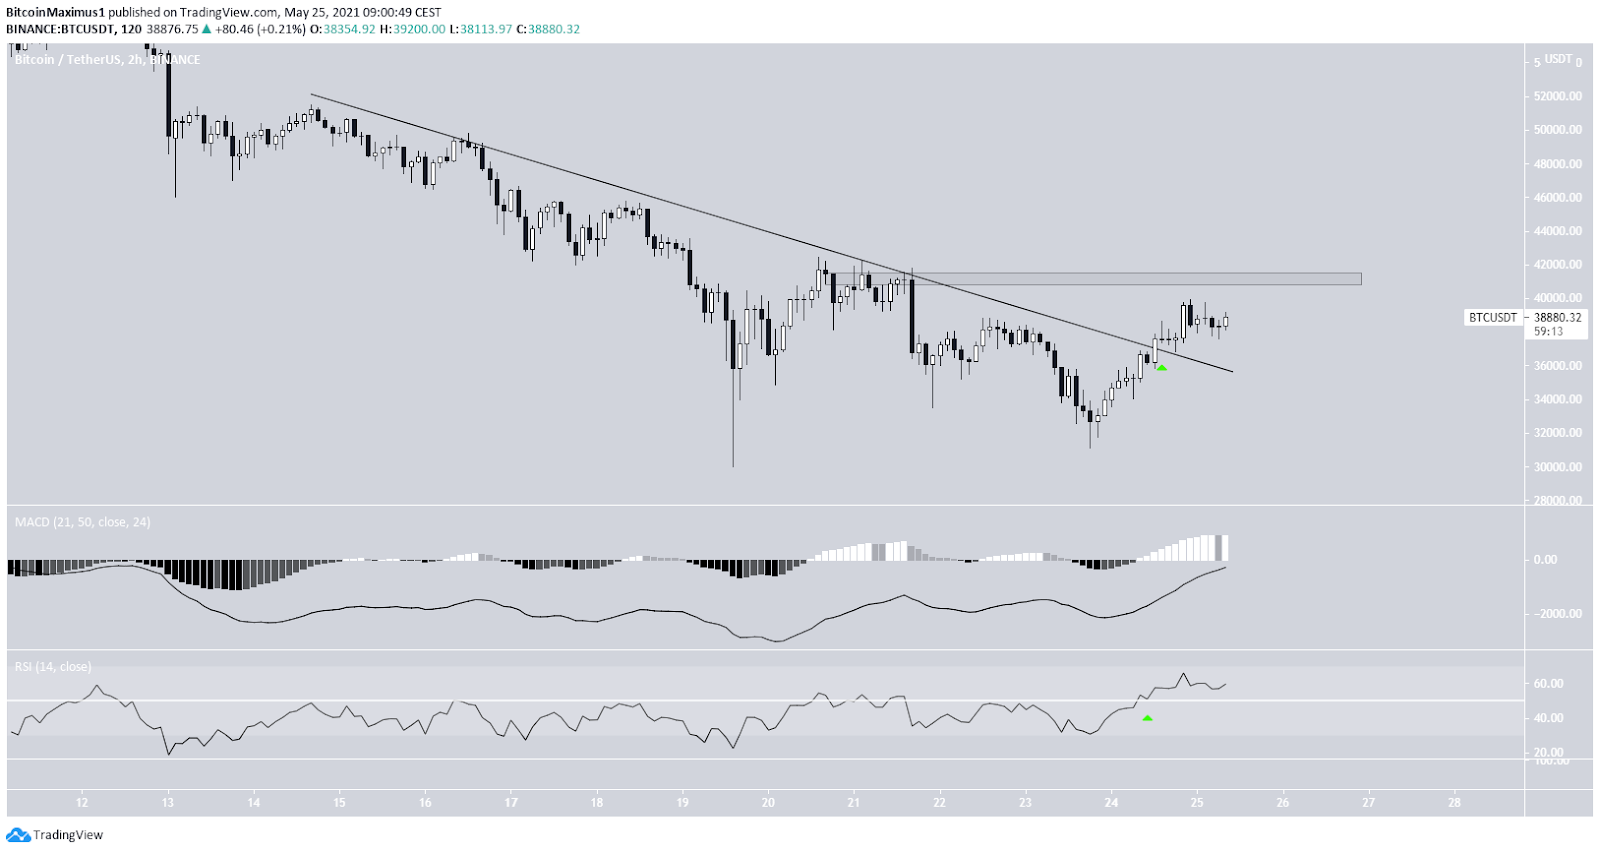 Bitcoin Preis Kurs 2-Stunden-Chart 25.05.2021